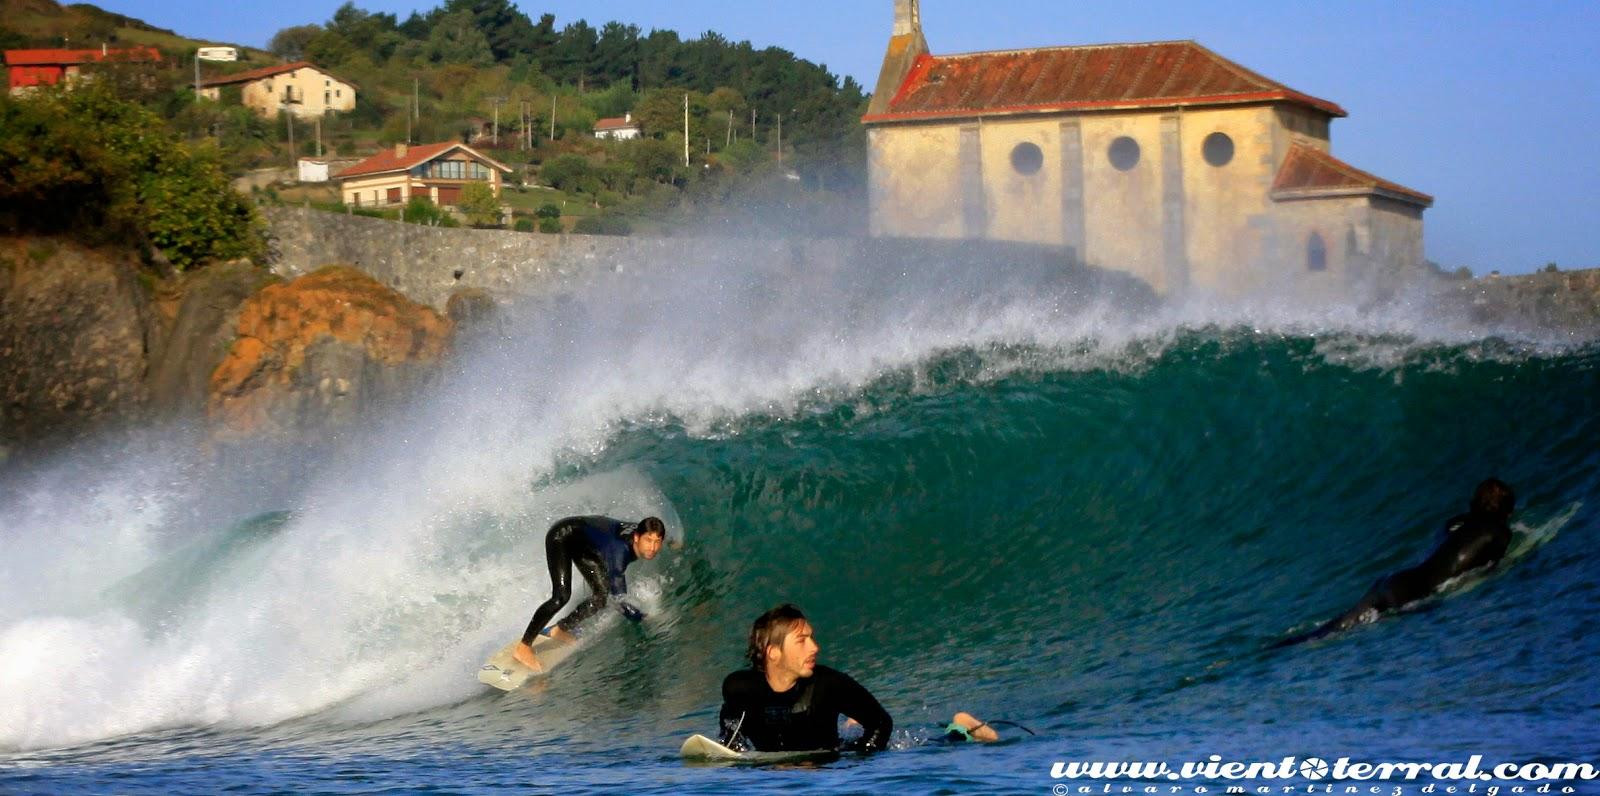 sesion mundaka octubre viento terral surf %2B(1)